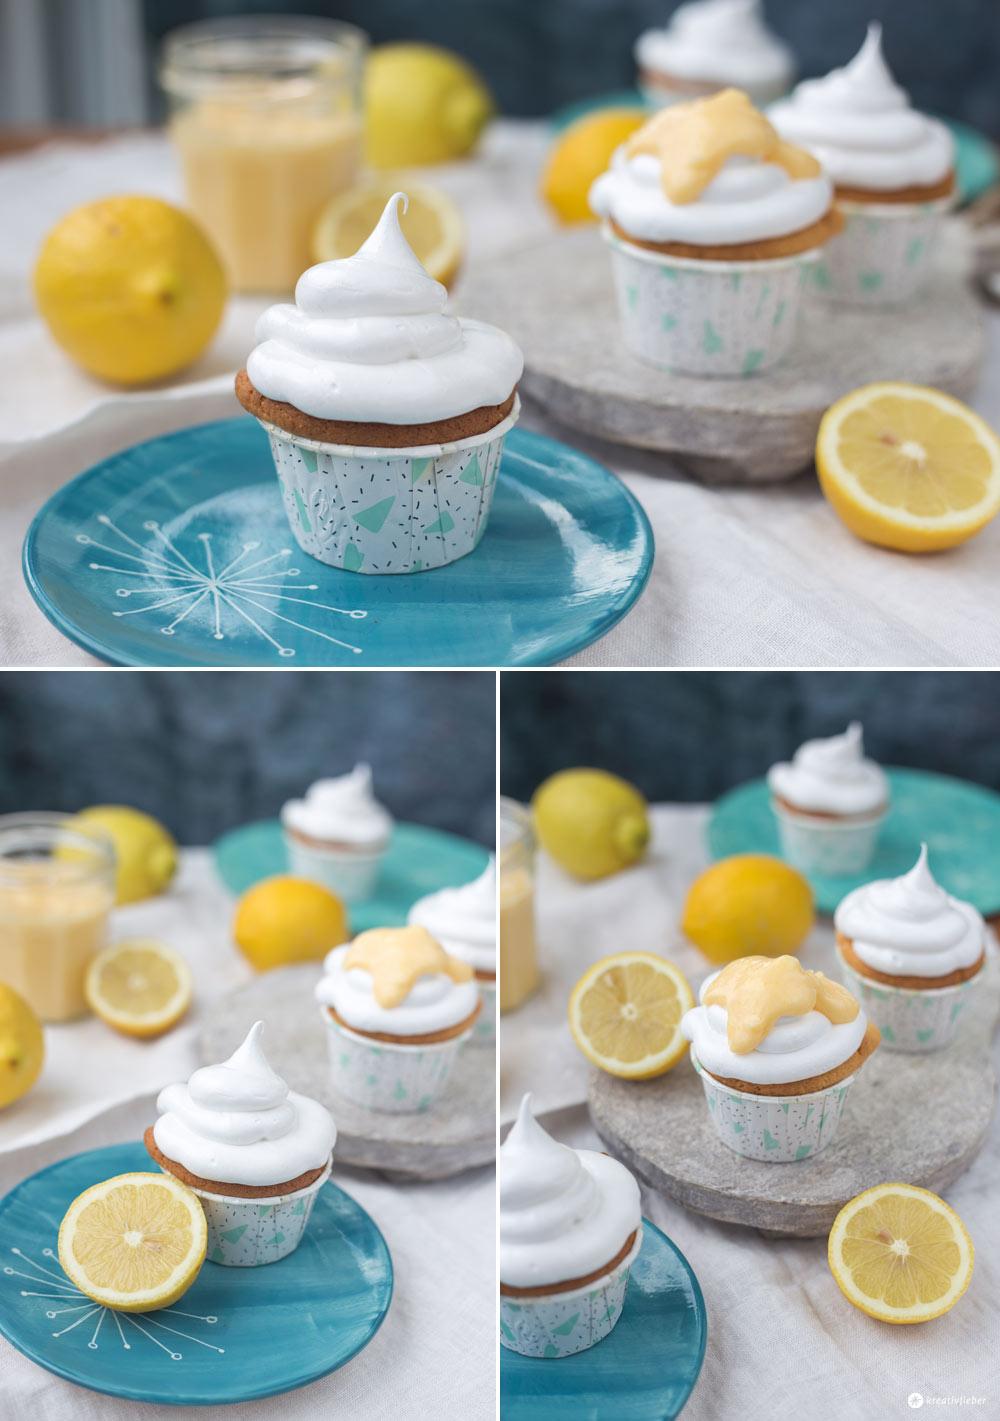 Lemon Curd Cupcakes mit Schokokuss Topping - leckere Cupcake Rezeptidee